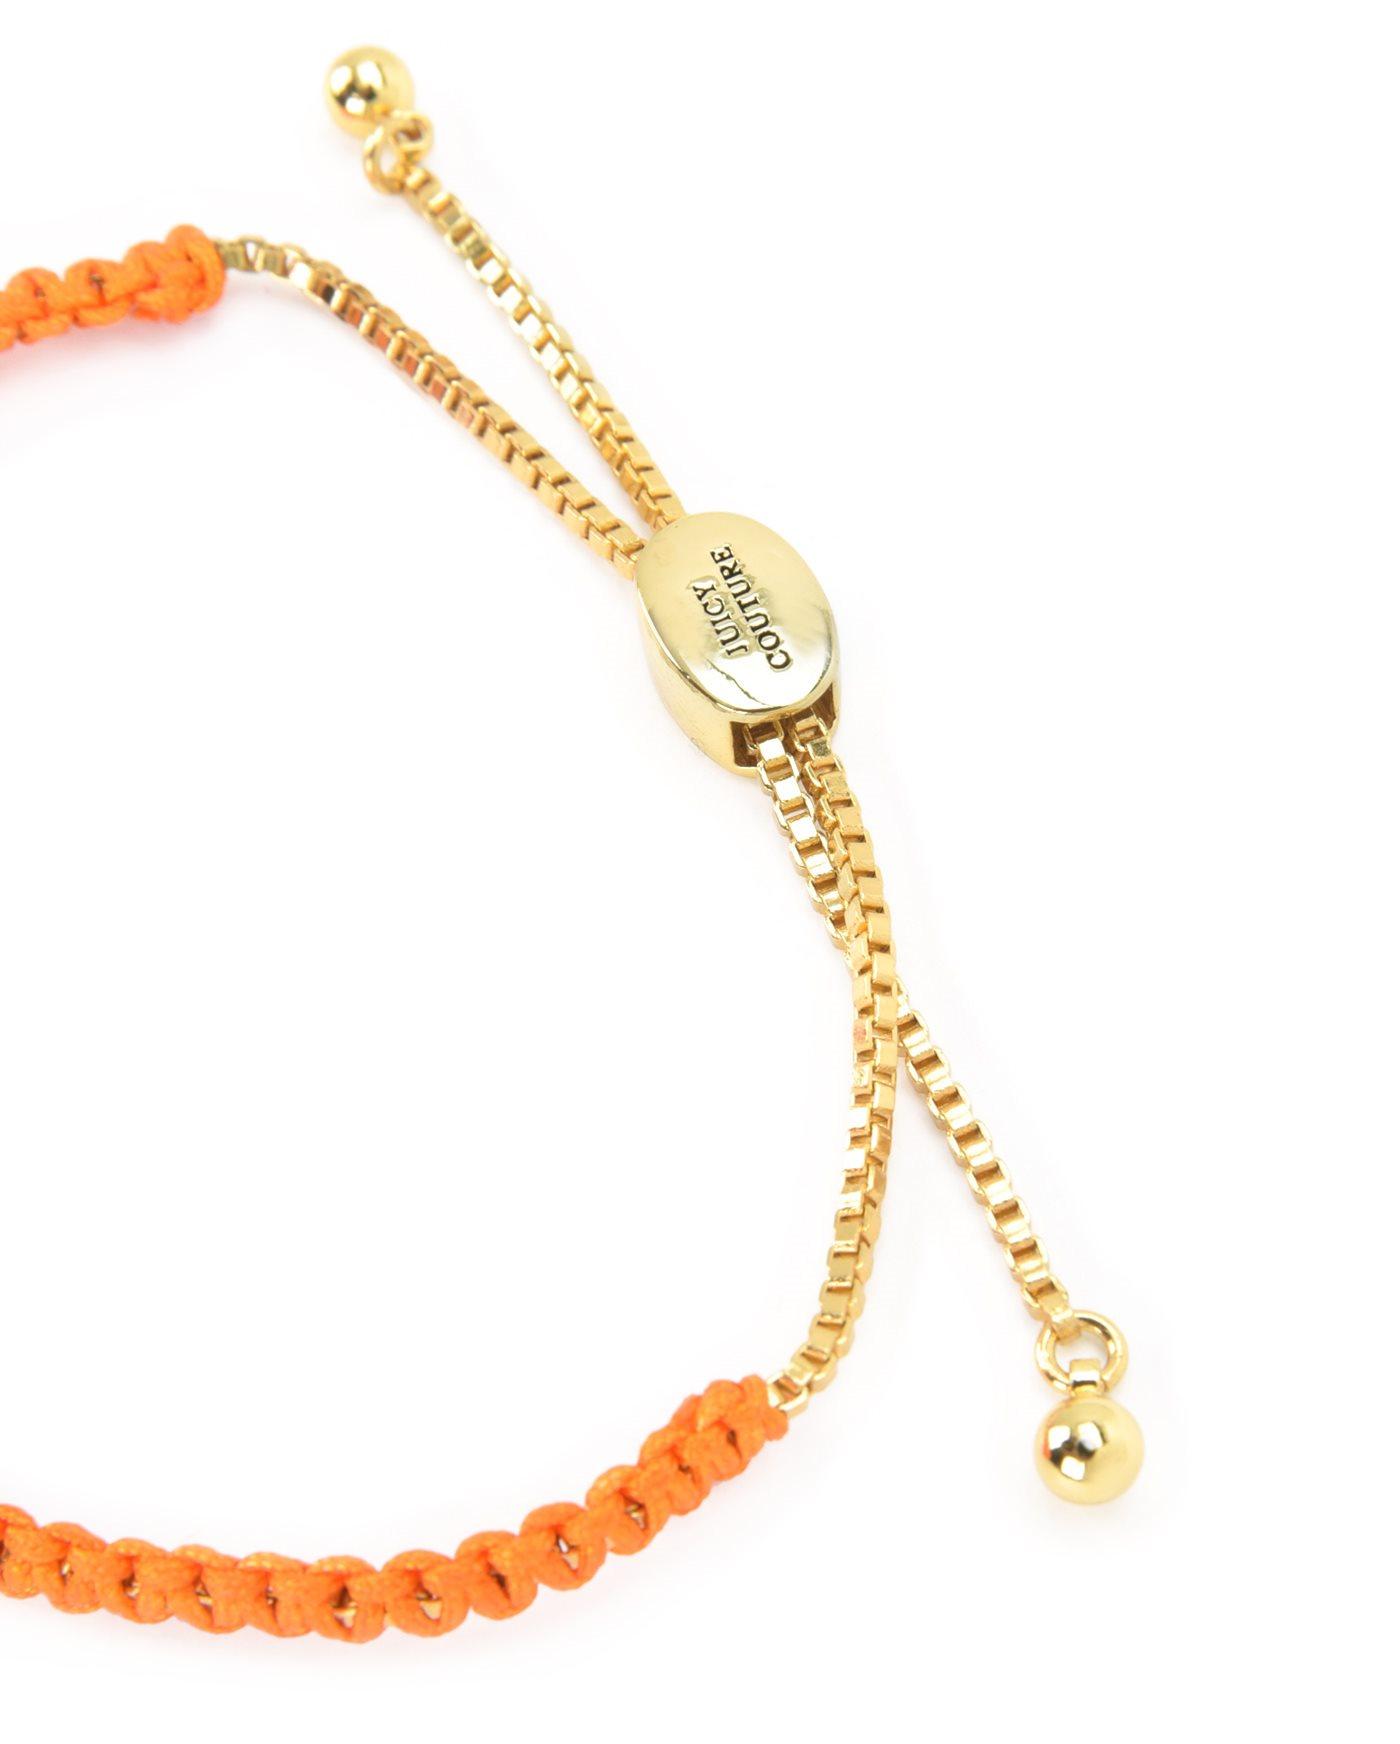 Juicy couture Juicy Heart Macrame Bracelet in Orange | Lyst